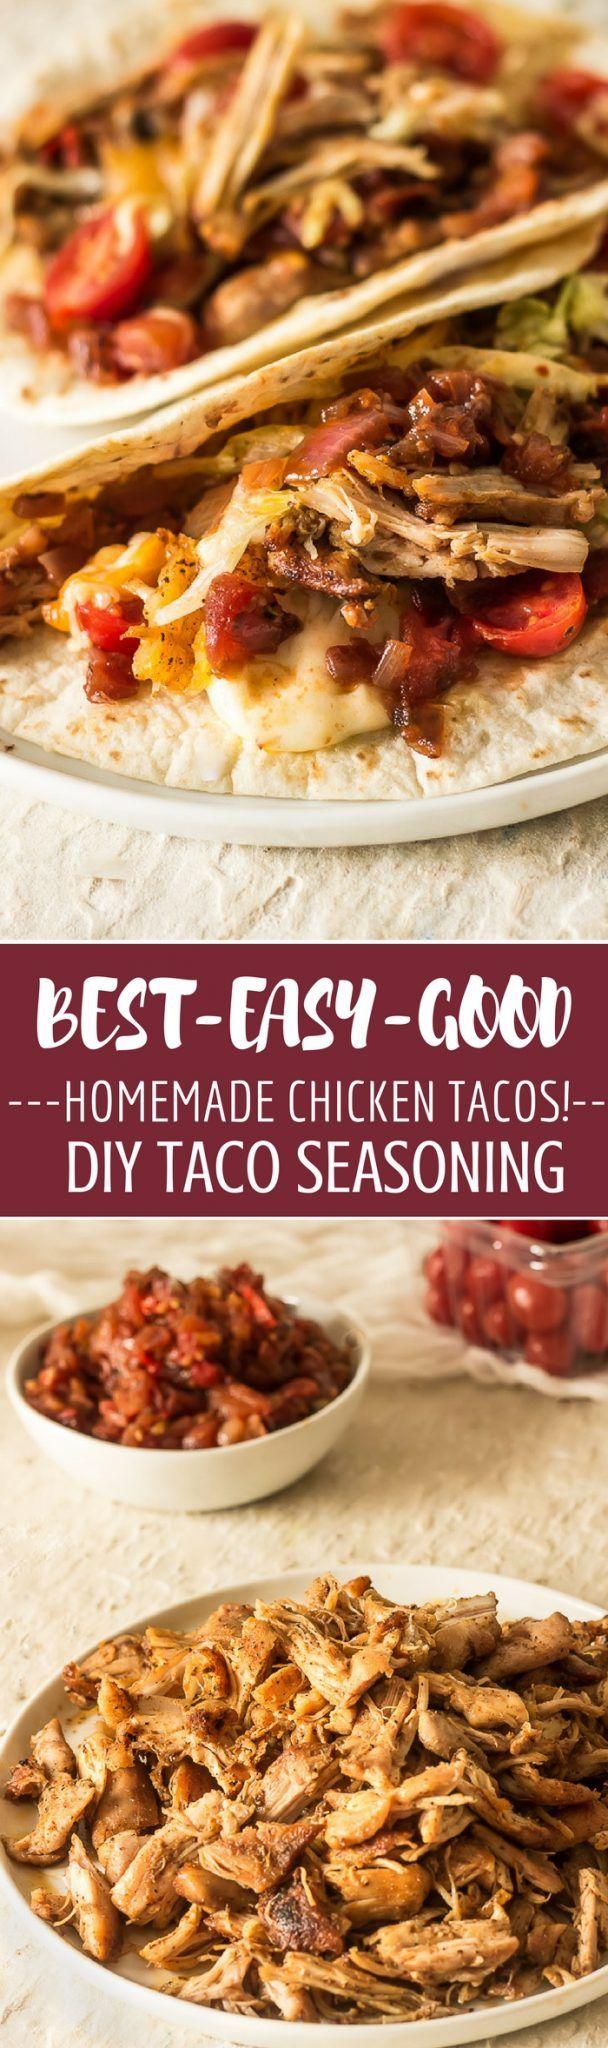 Chicken Tacos with Homemade Taco Seasoning and Habanero Salsa